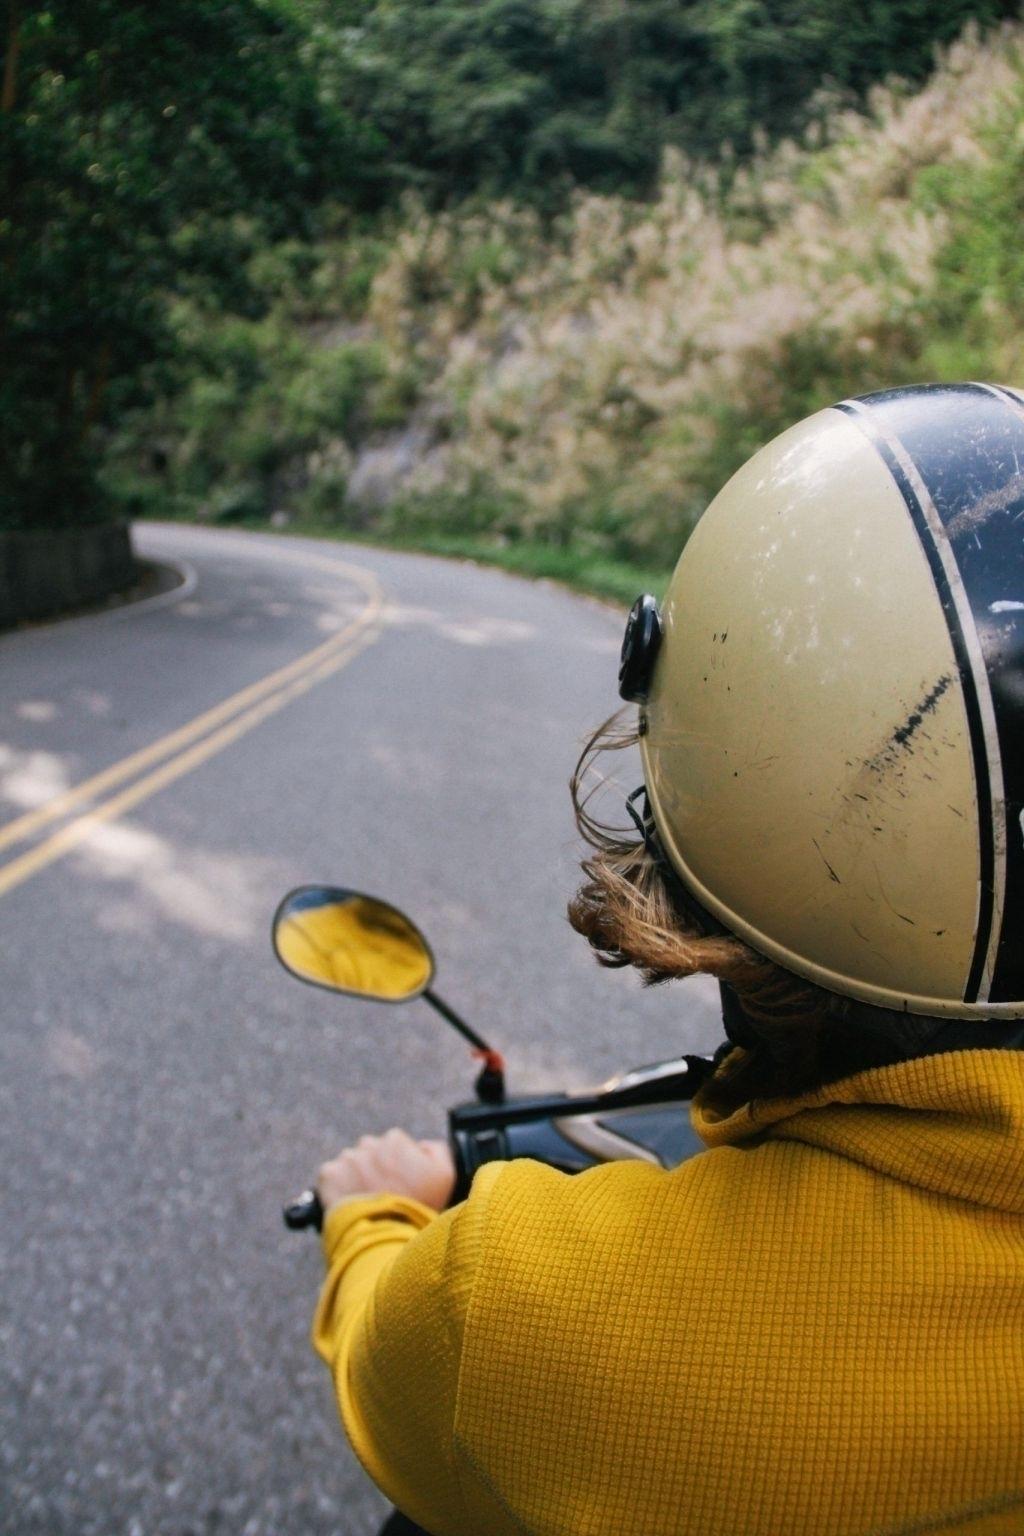 gear put leather jacket ride Hi - hikithe | ello